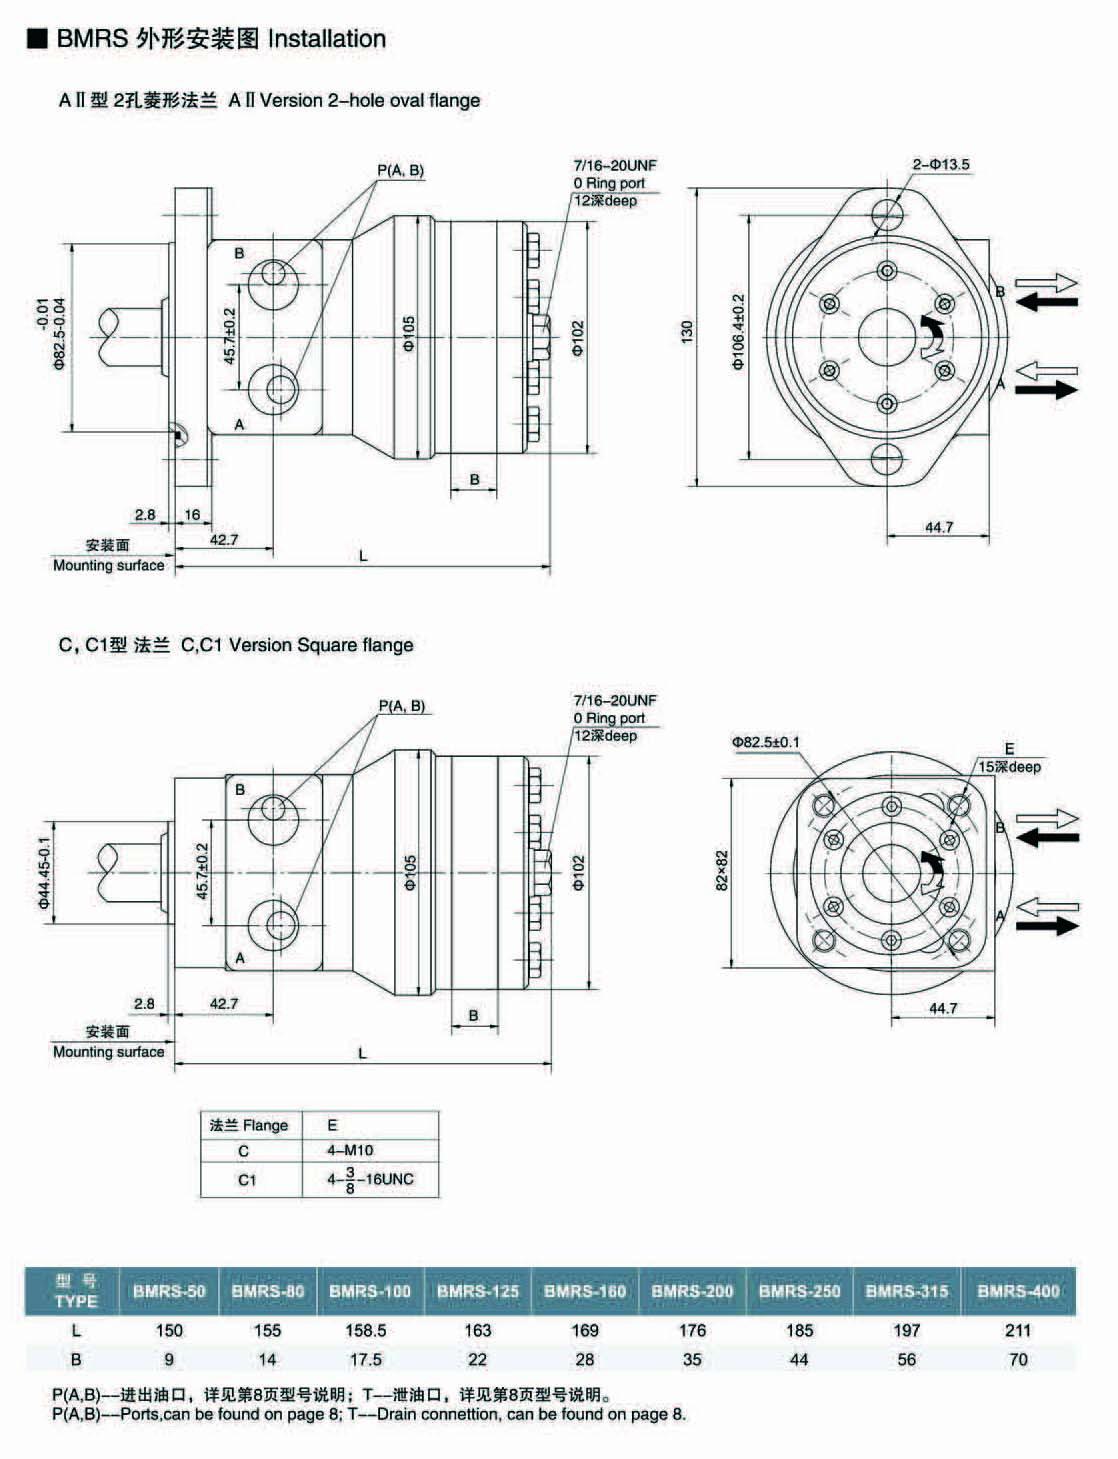 蚌埠BM4-400P1A4Y3,擺線馬達